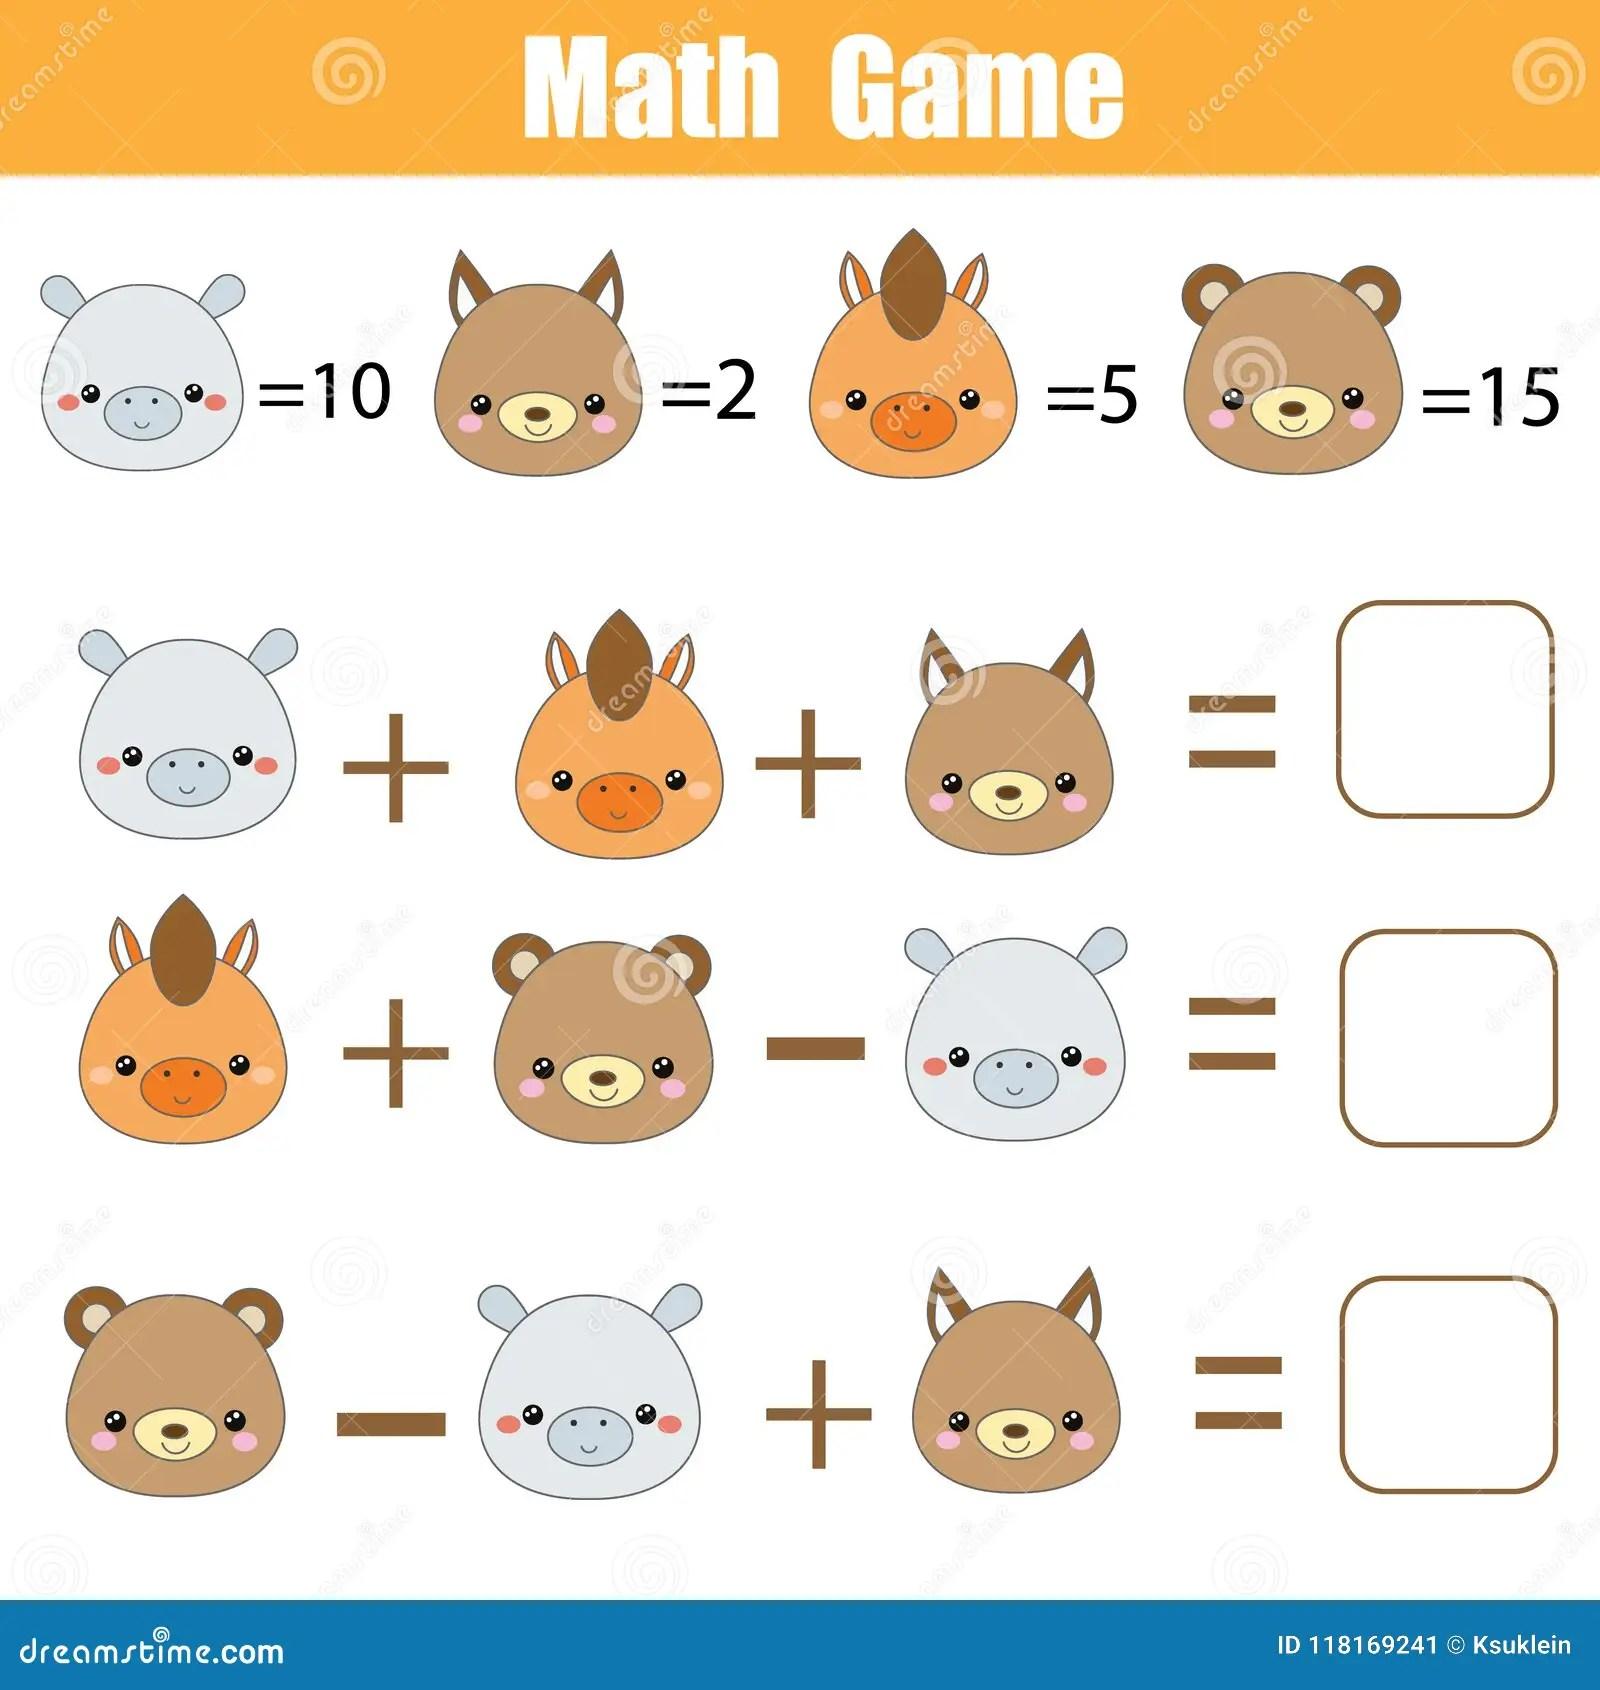 Math Educational Game Counting Equations Mathematics